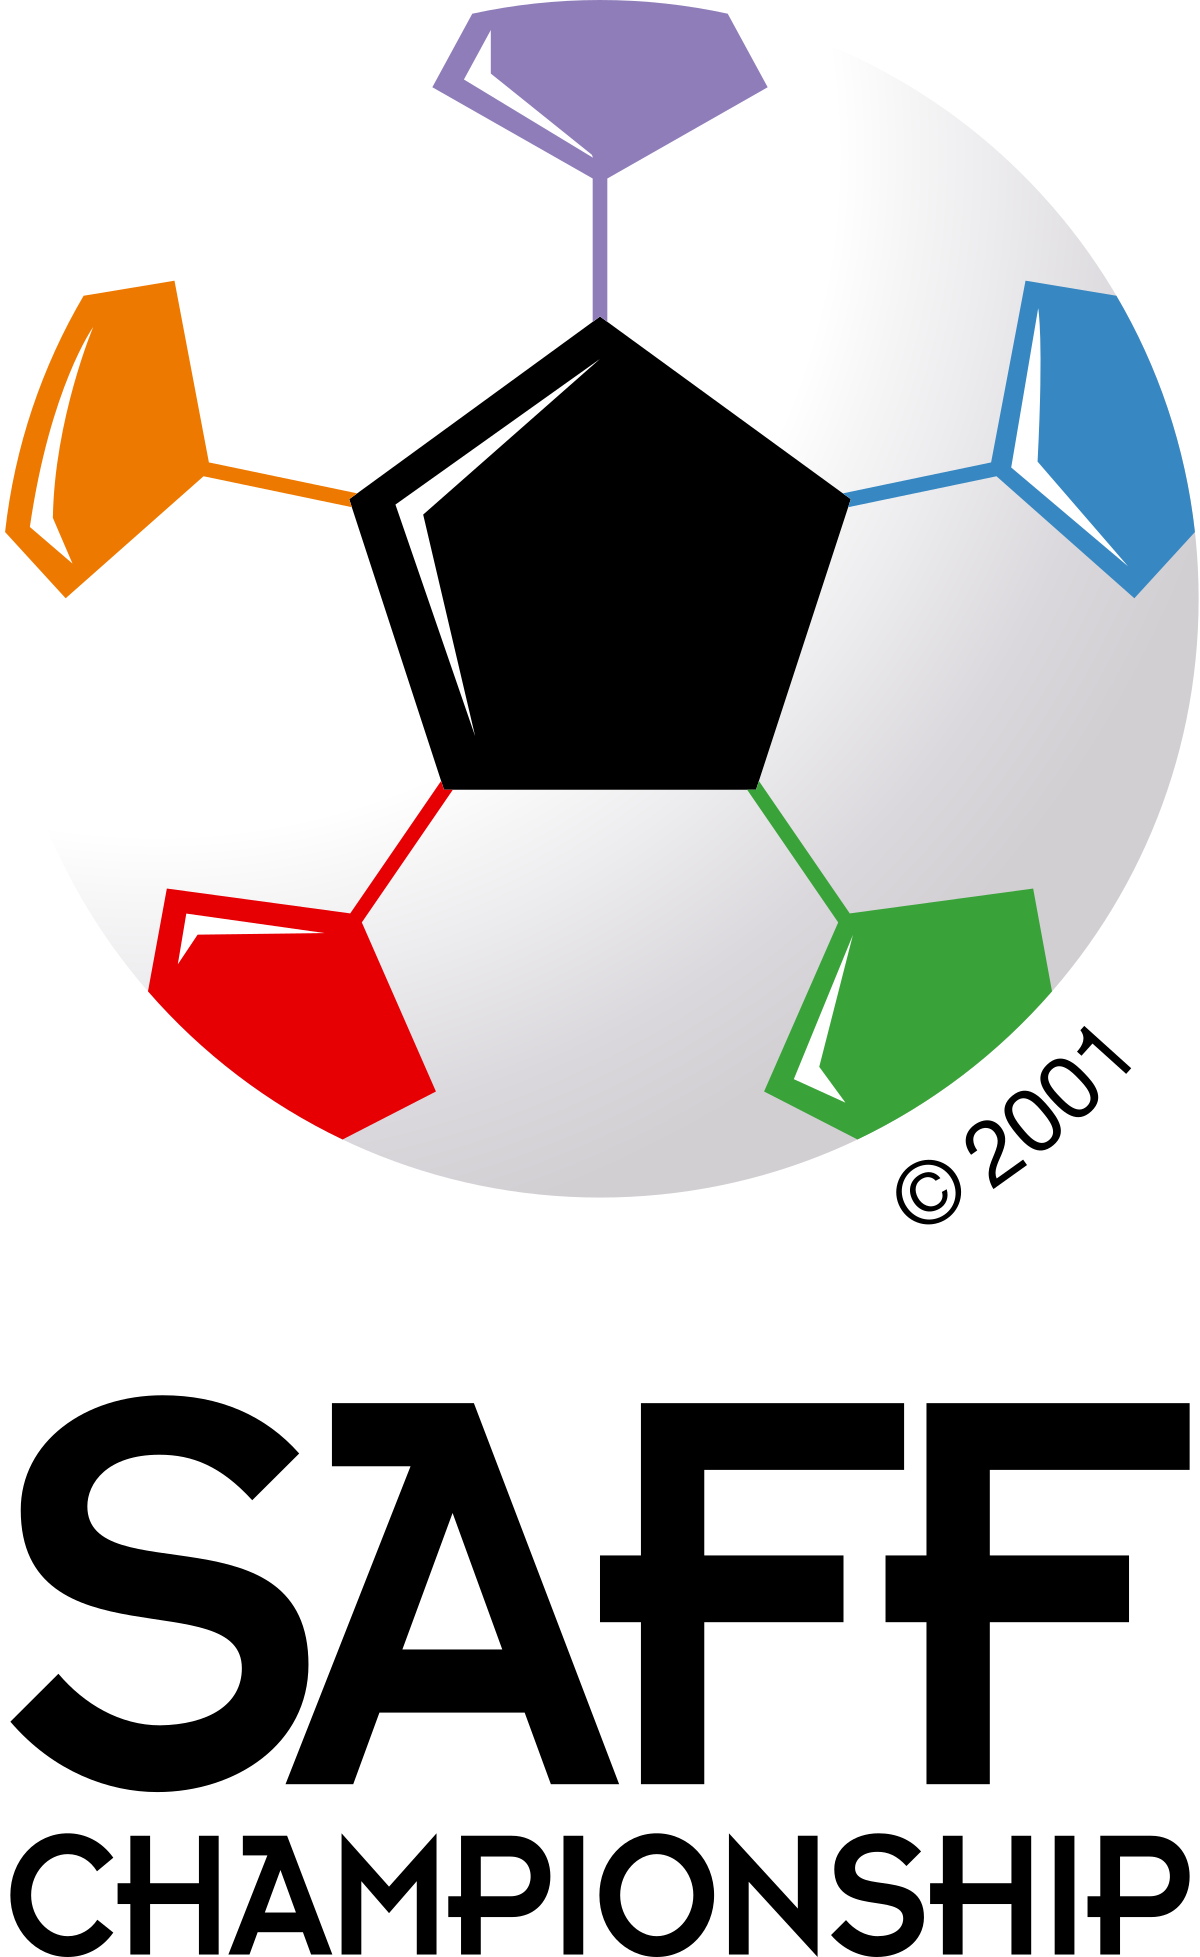 Goal clipart football tournament. Saff championship wikipedia